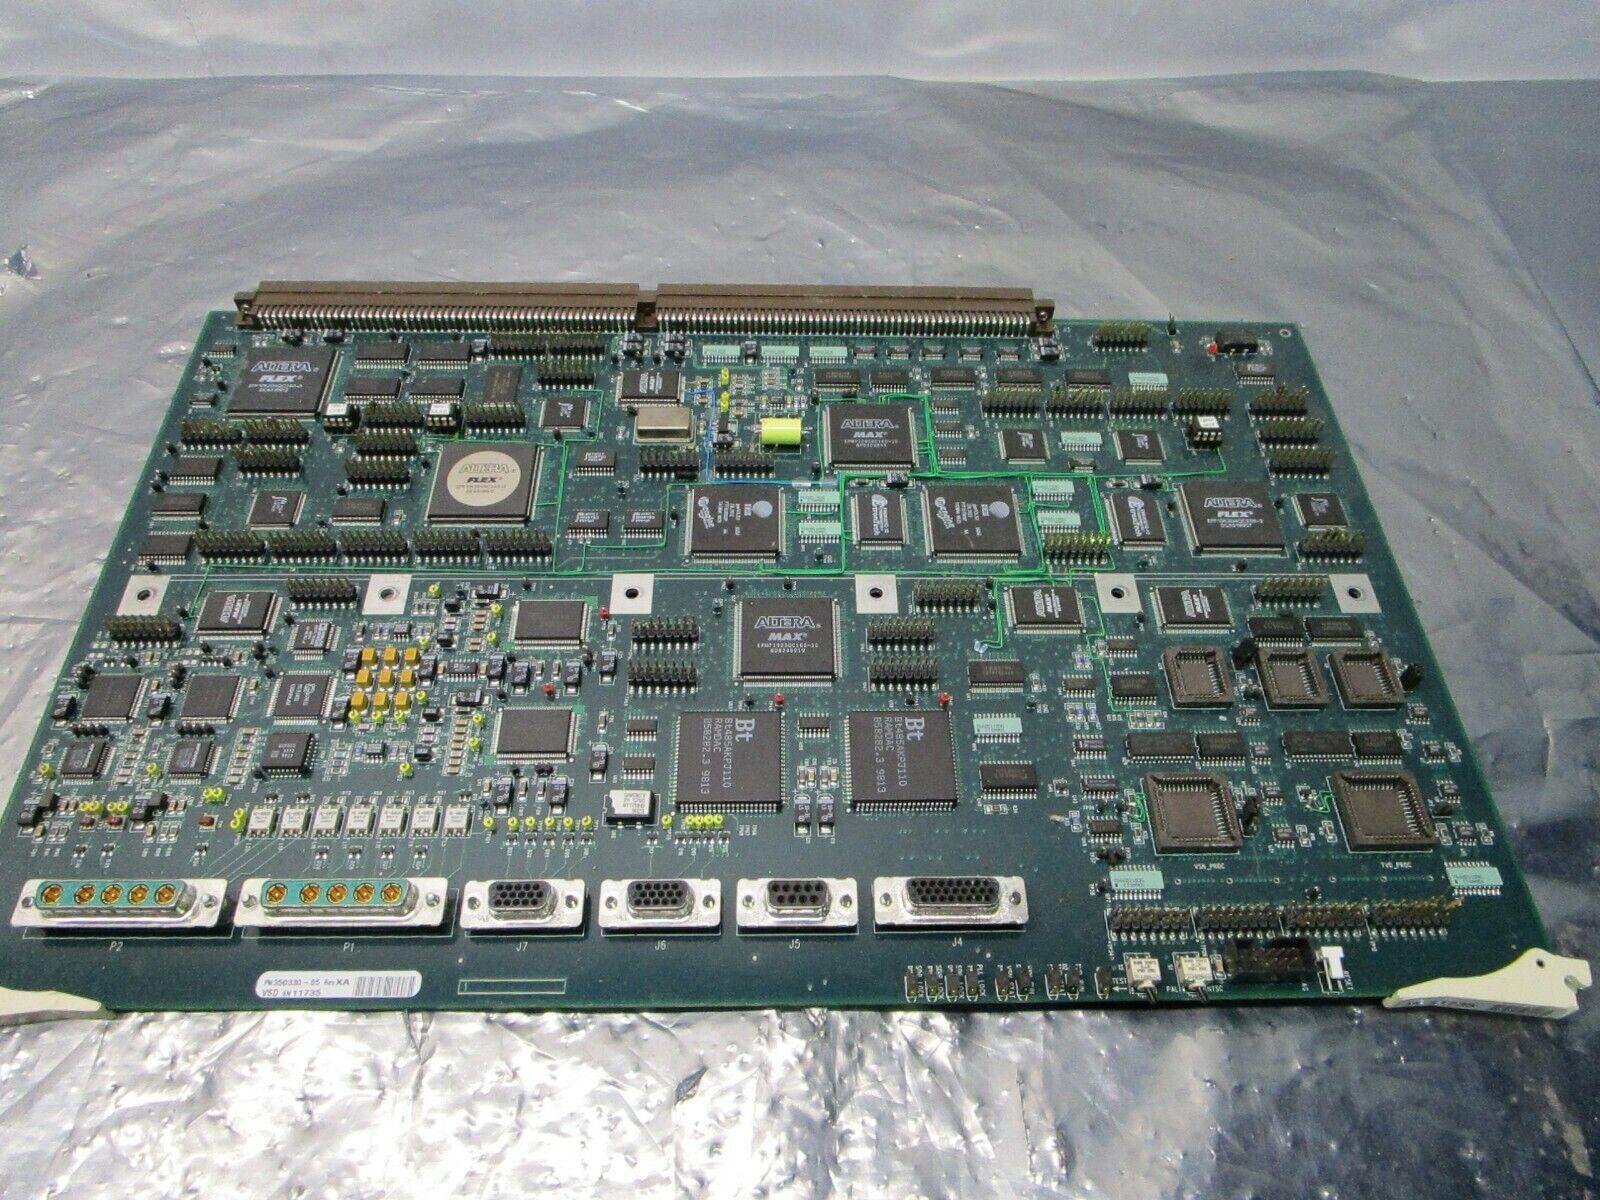 I.S.I. 350330-05 Board, PCB 350335-01, 101226